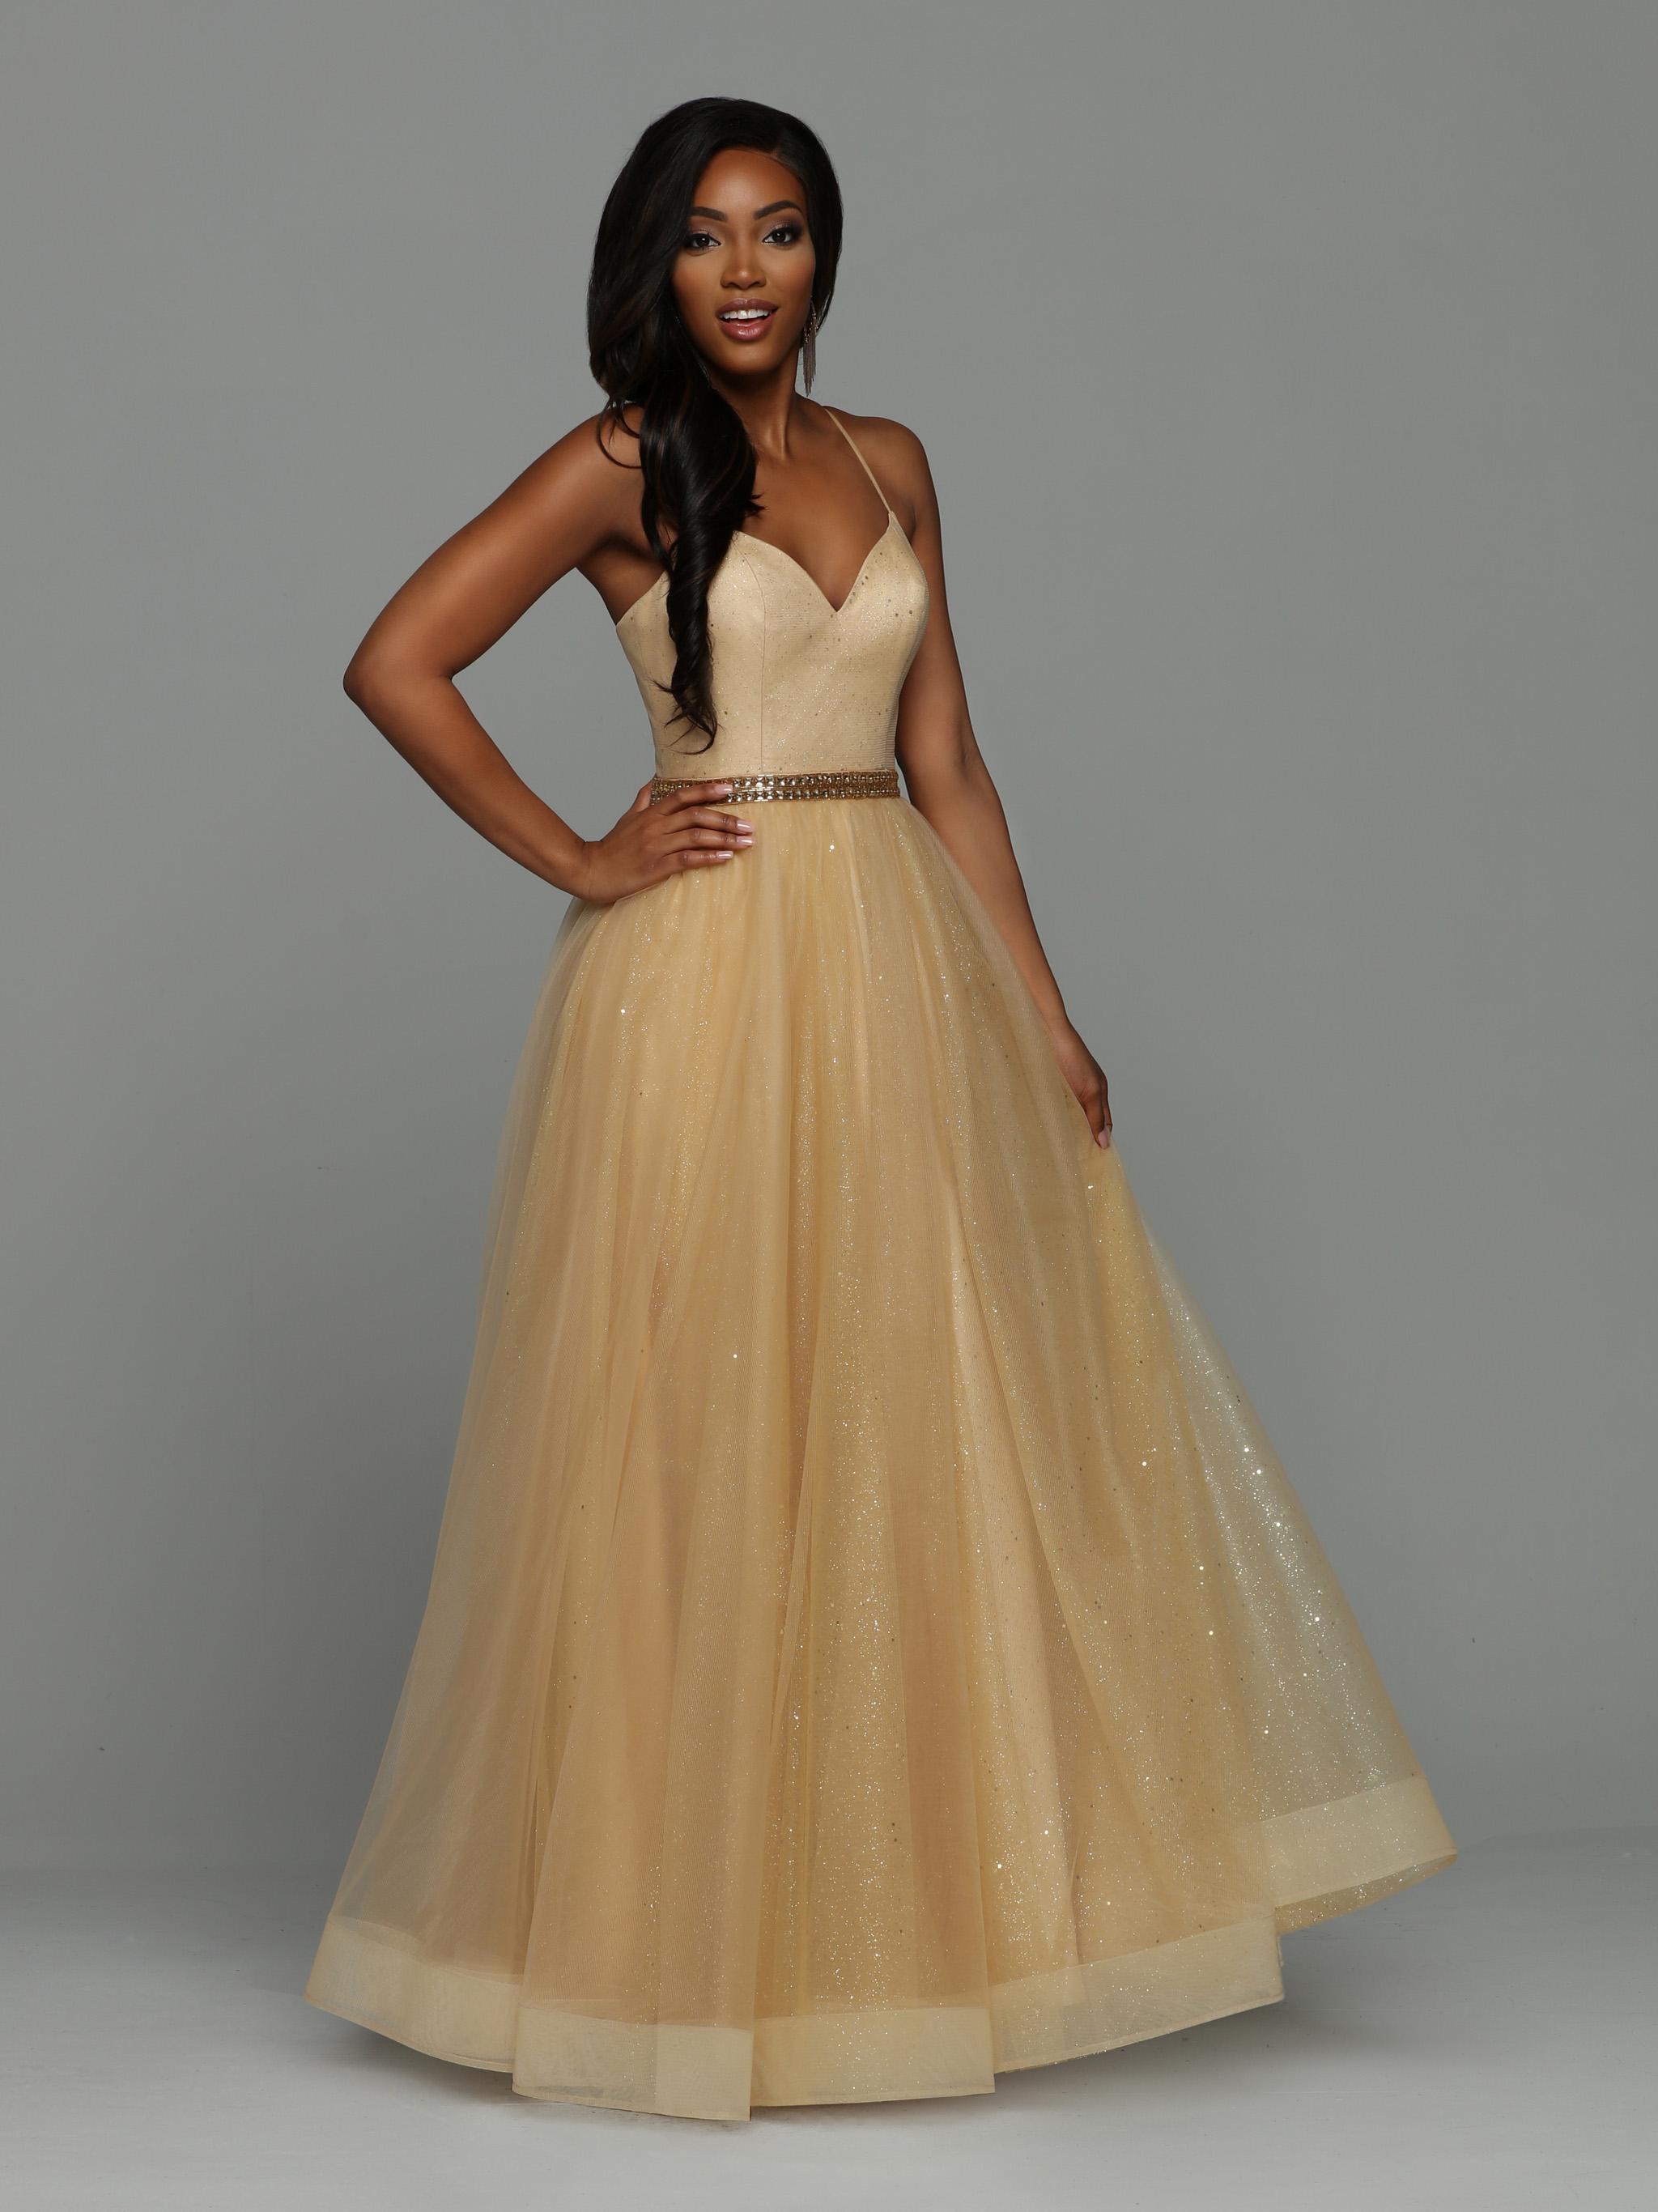 9b7d024902bb83 NEW for 2019! Style #71972: Glitter Tulle Ball Gown, Sweetheart Neckline,  Spaghetti Straps, Beaded Waistband